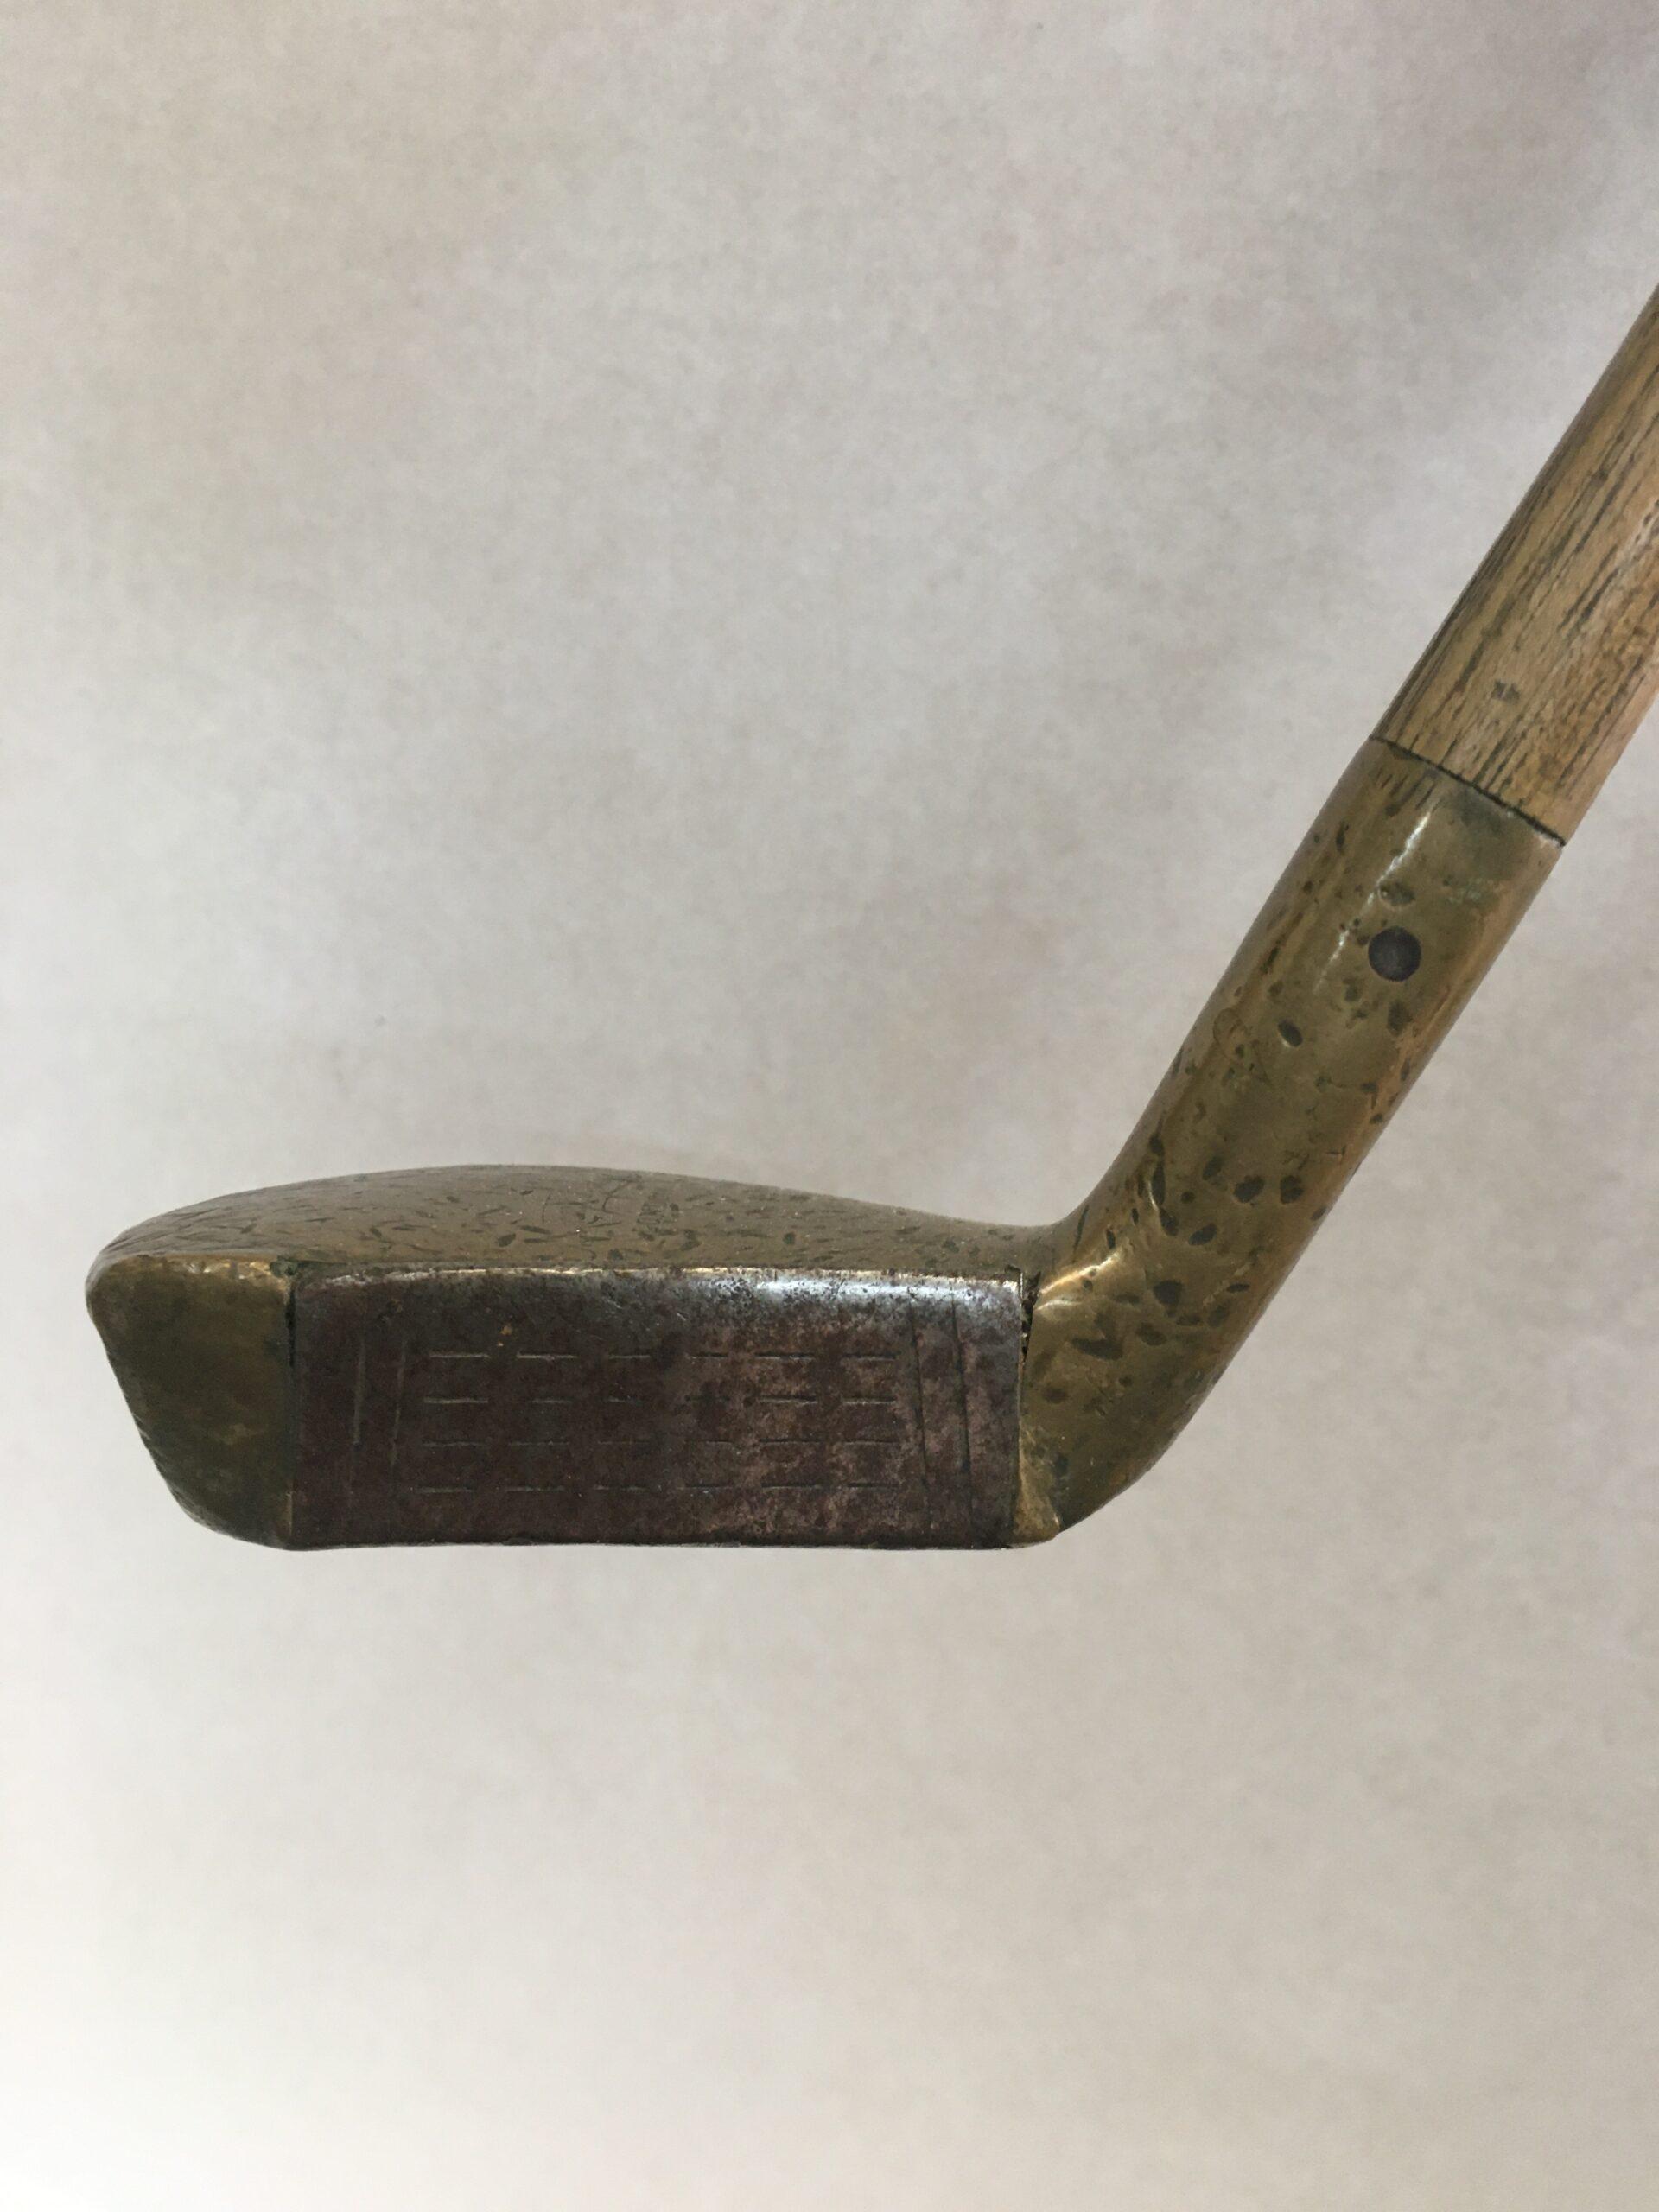 Blackheath Golf Co. ZoZo Putter c.1905